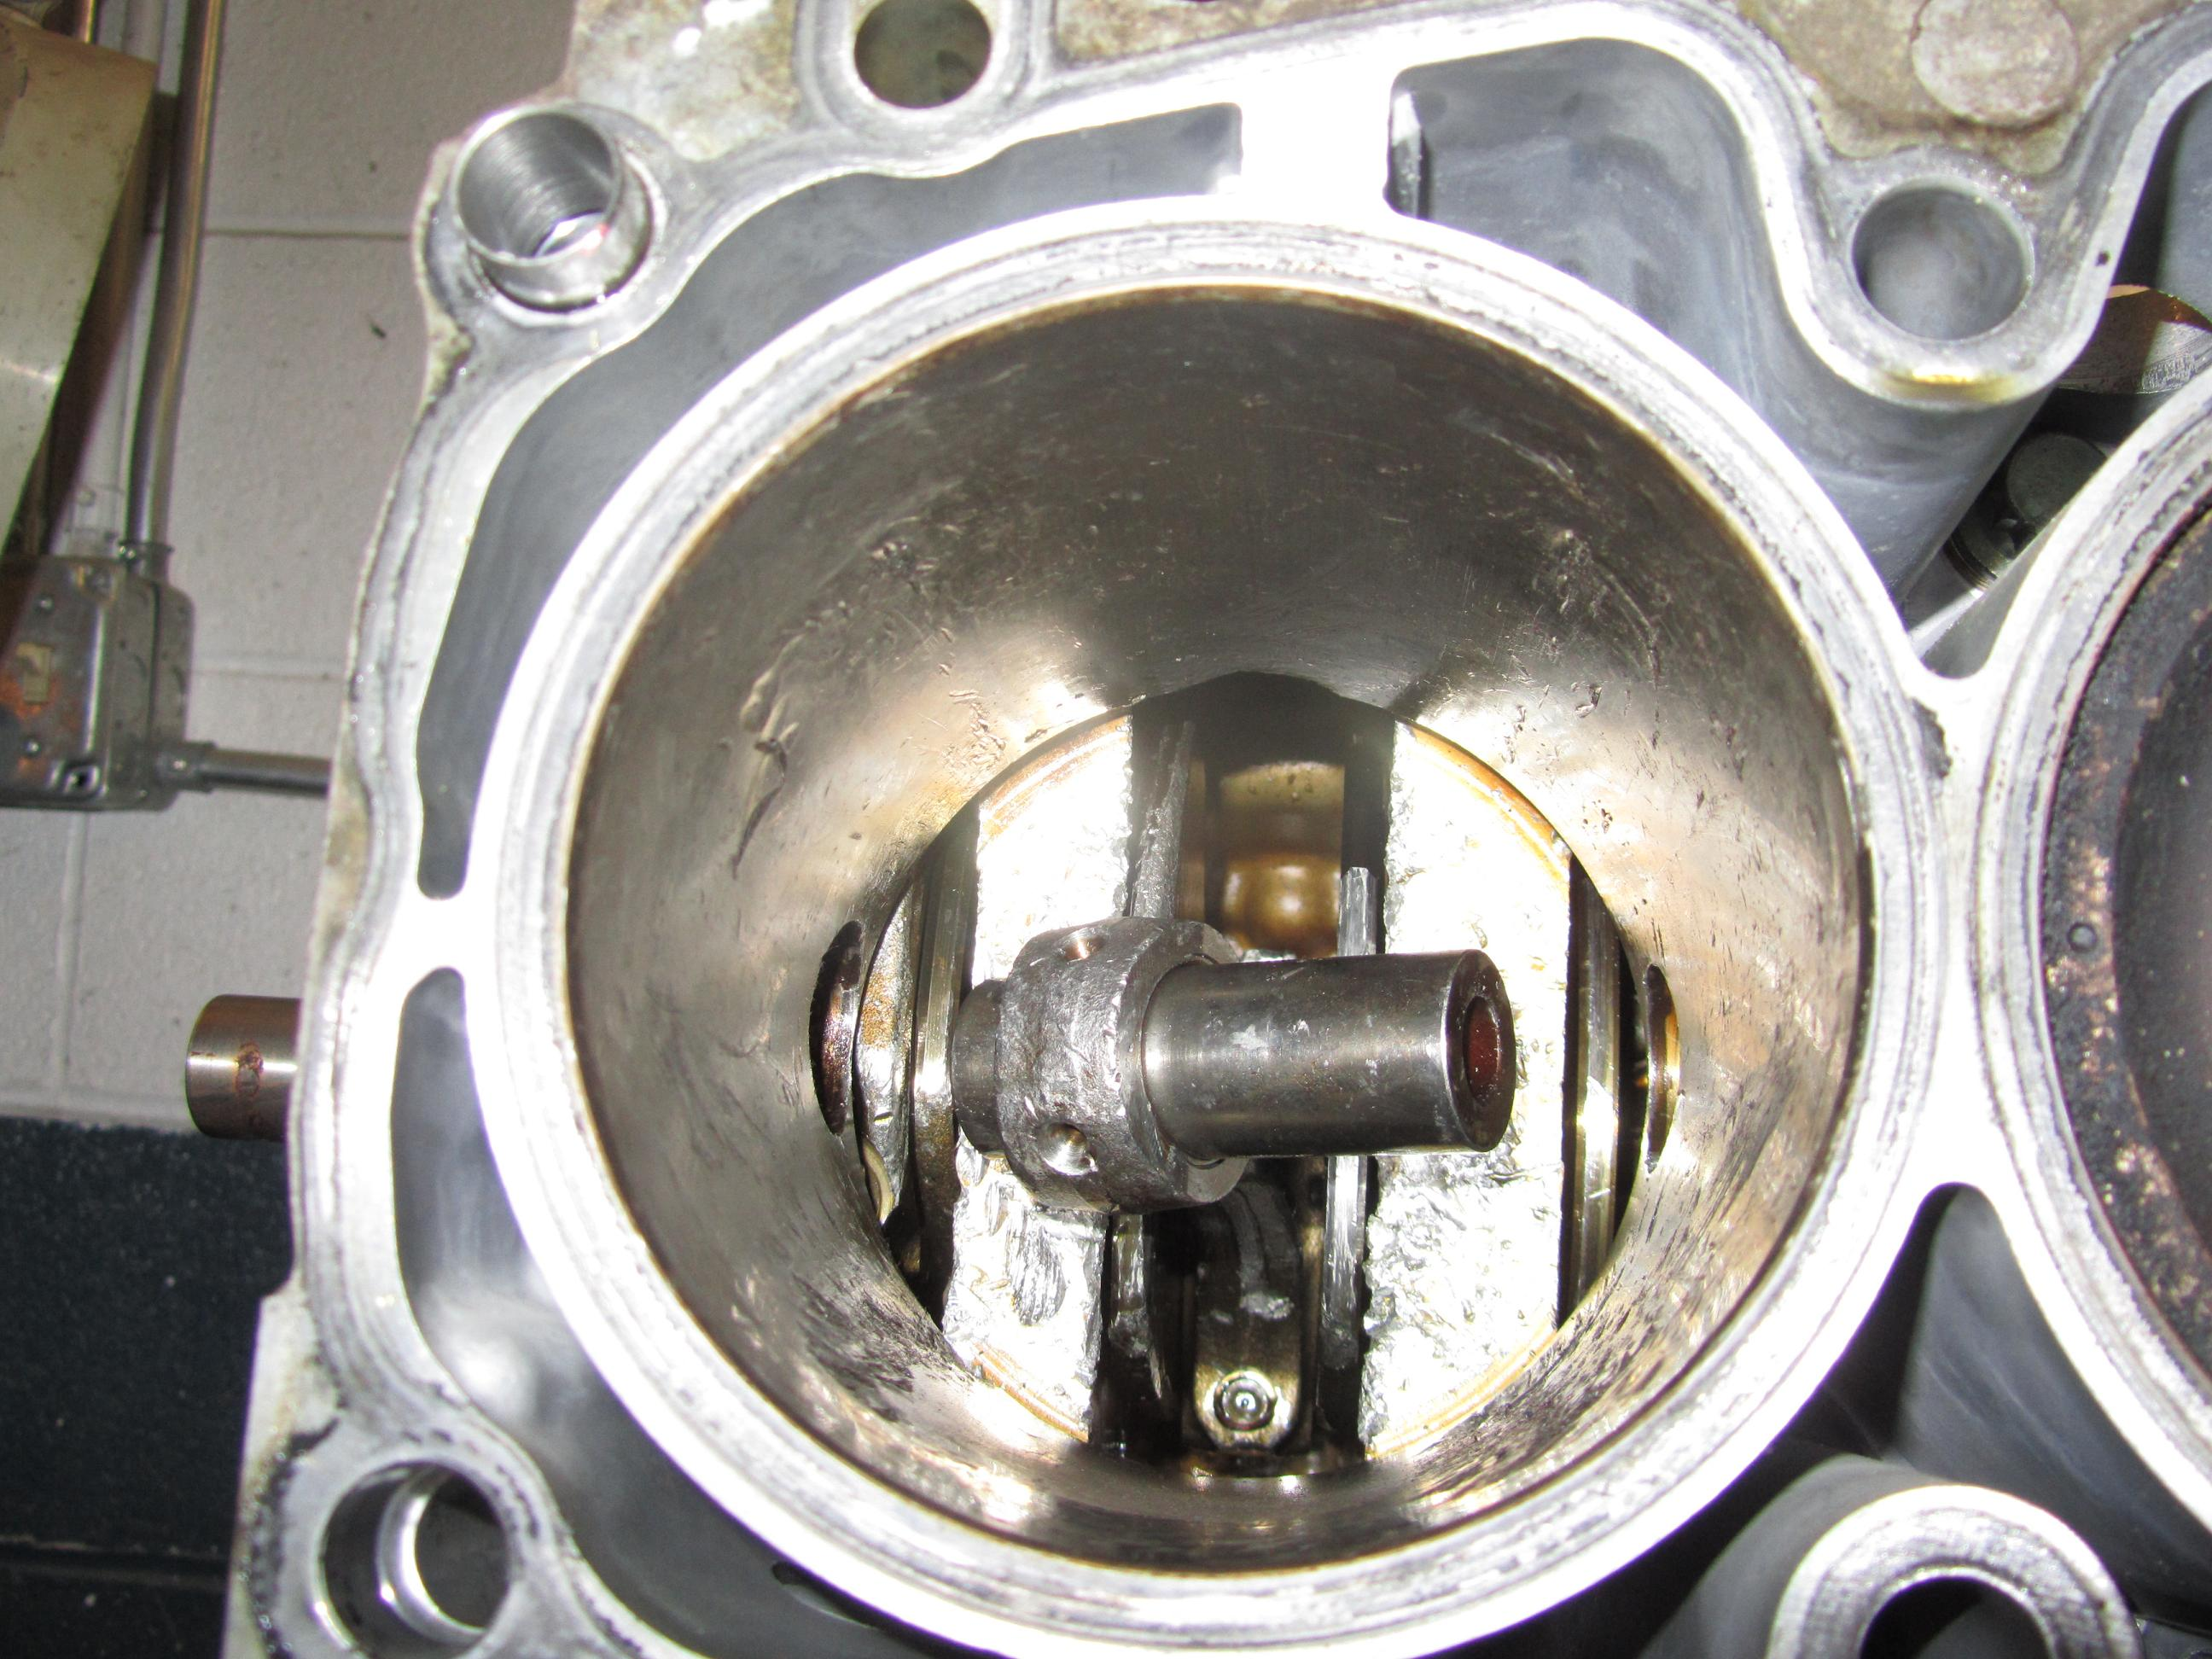 Click image for larger version  Name:Subaru  Grenade 001.jpg Views:91 Size:529.1 KB ID:51809